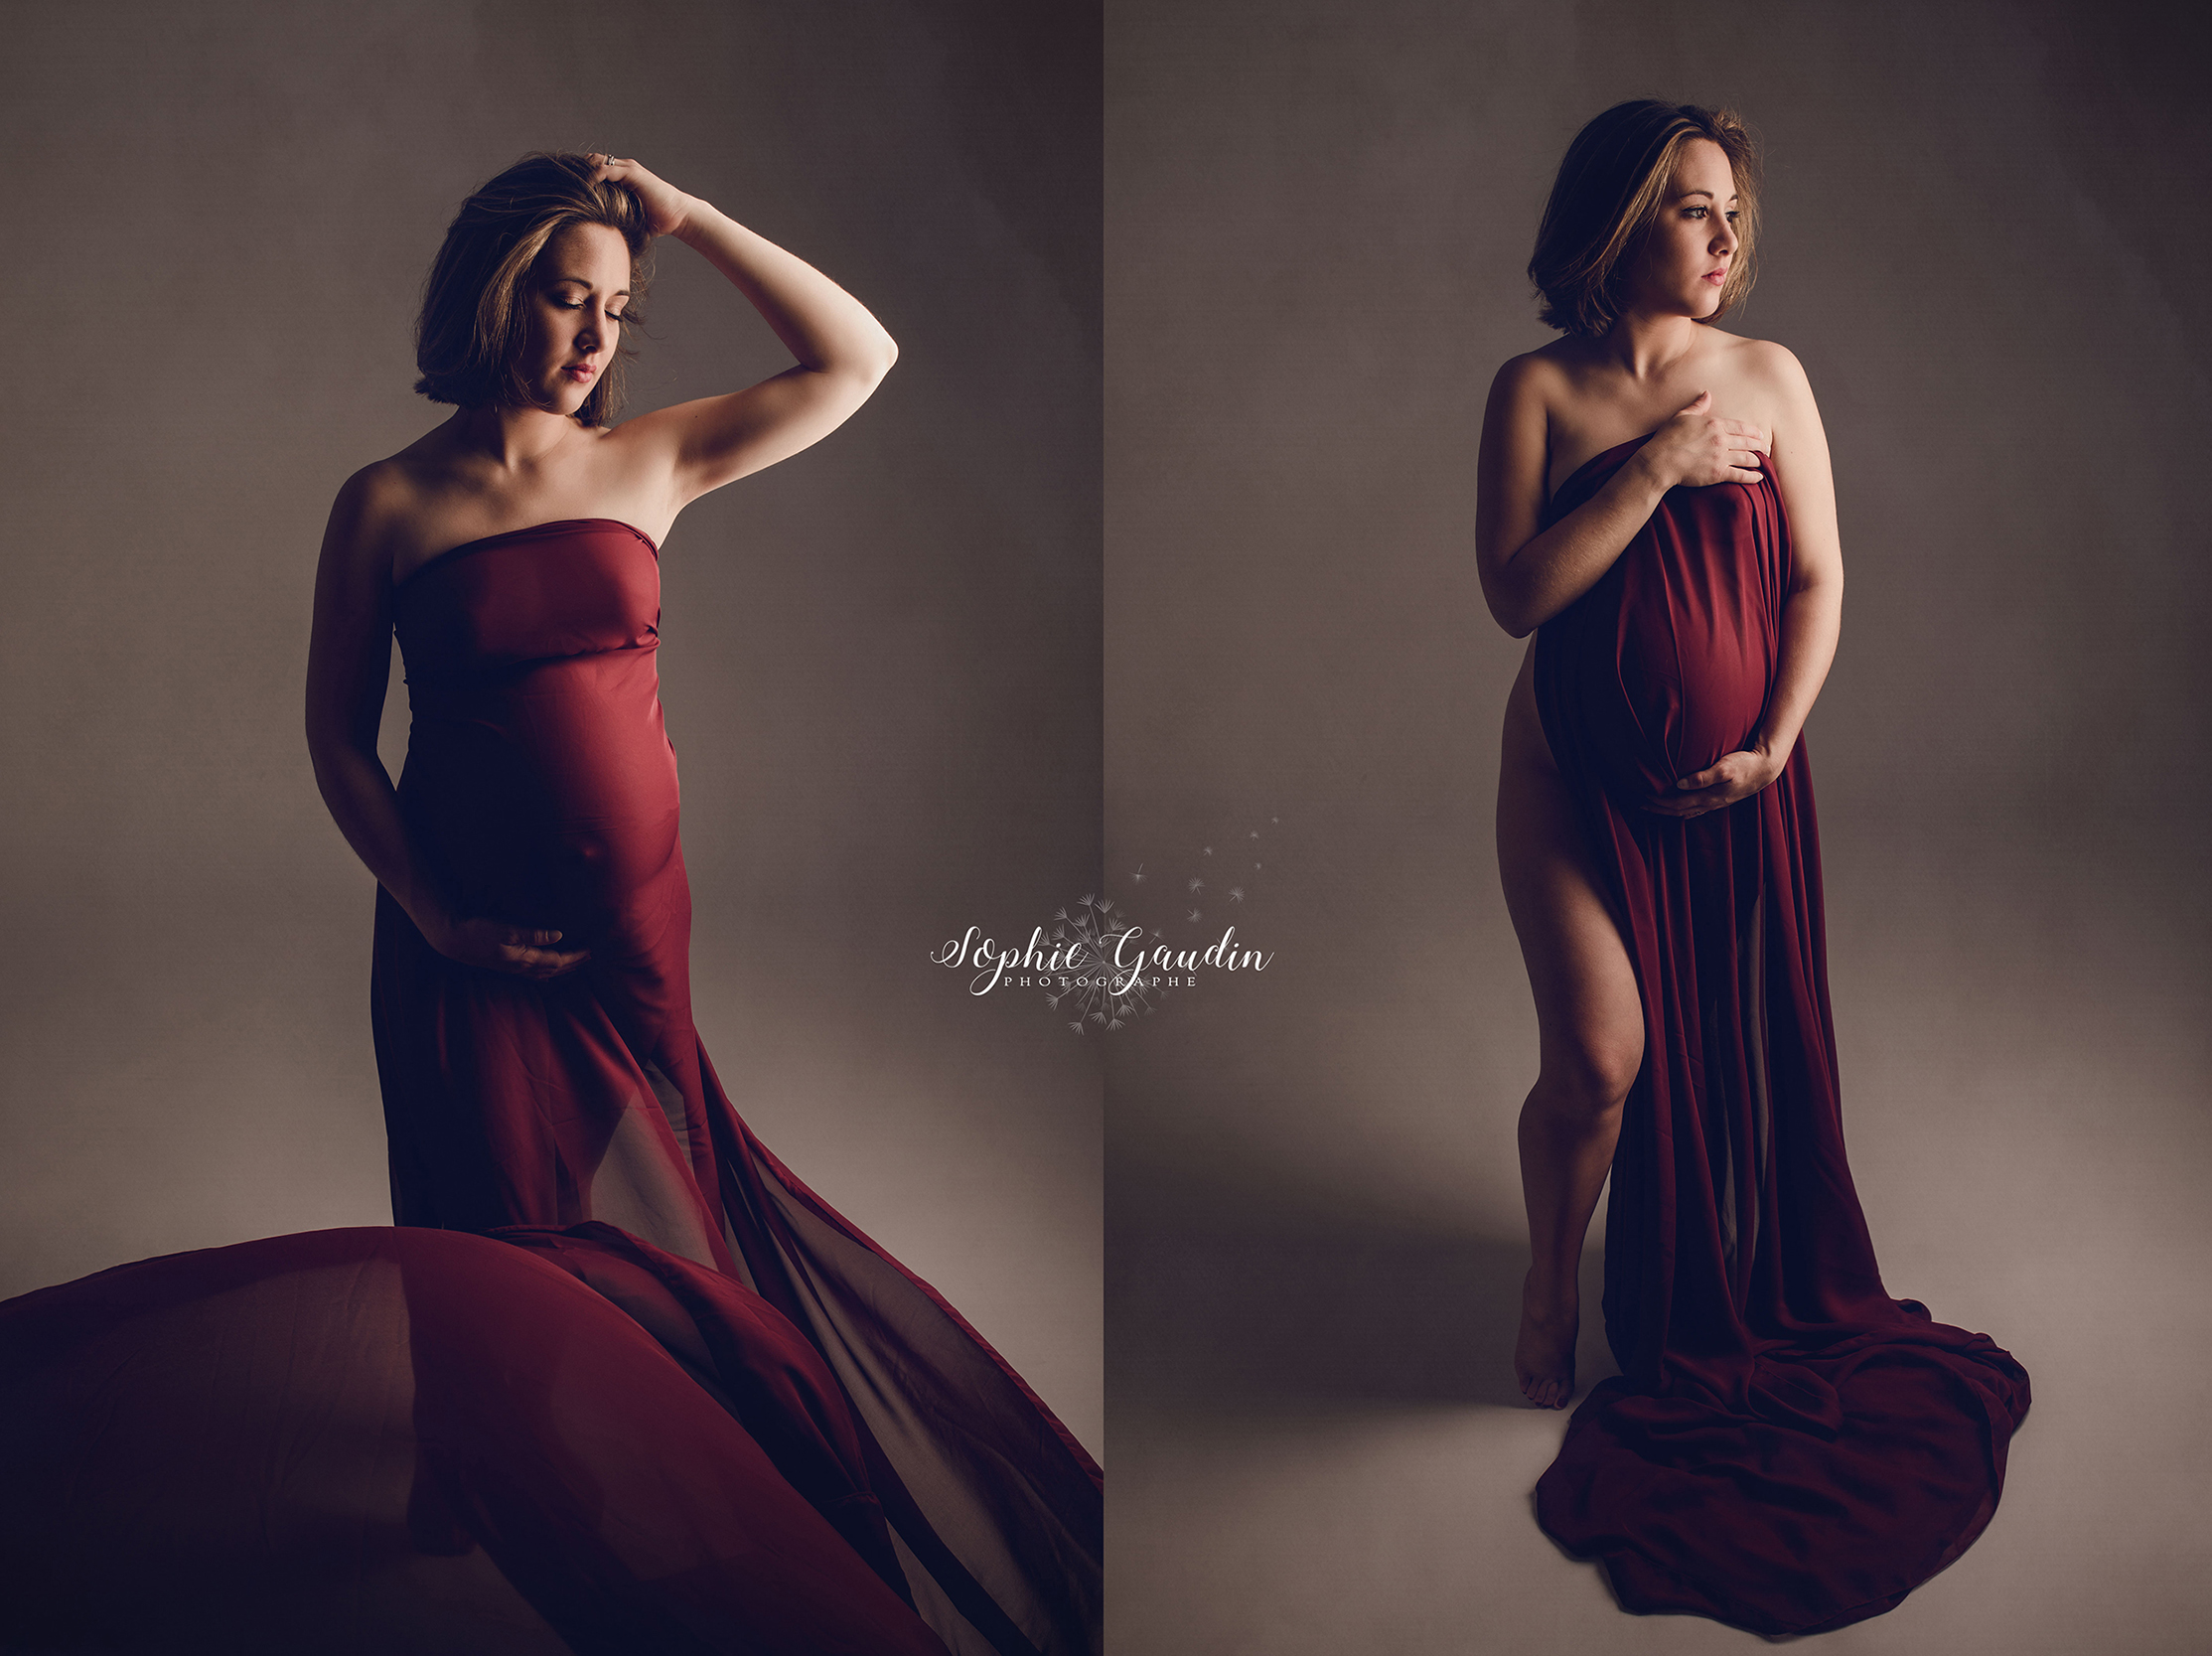 photographie-studio-grossesse